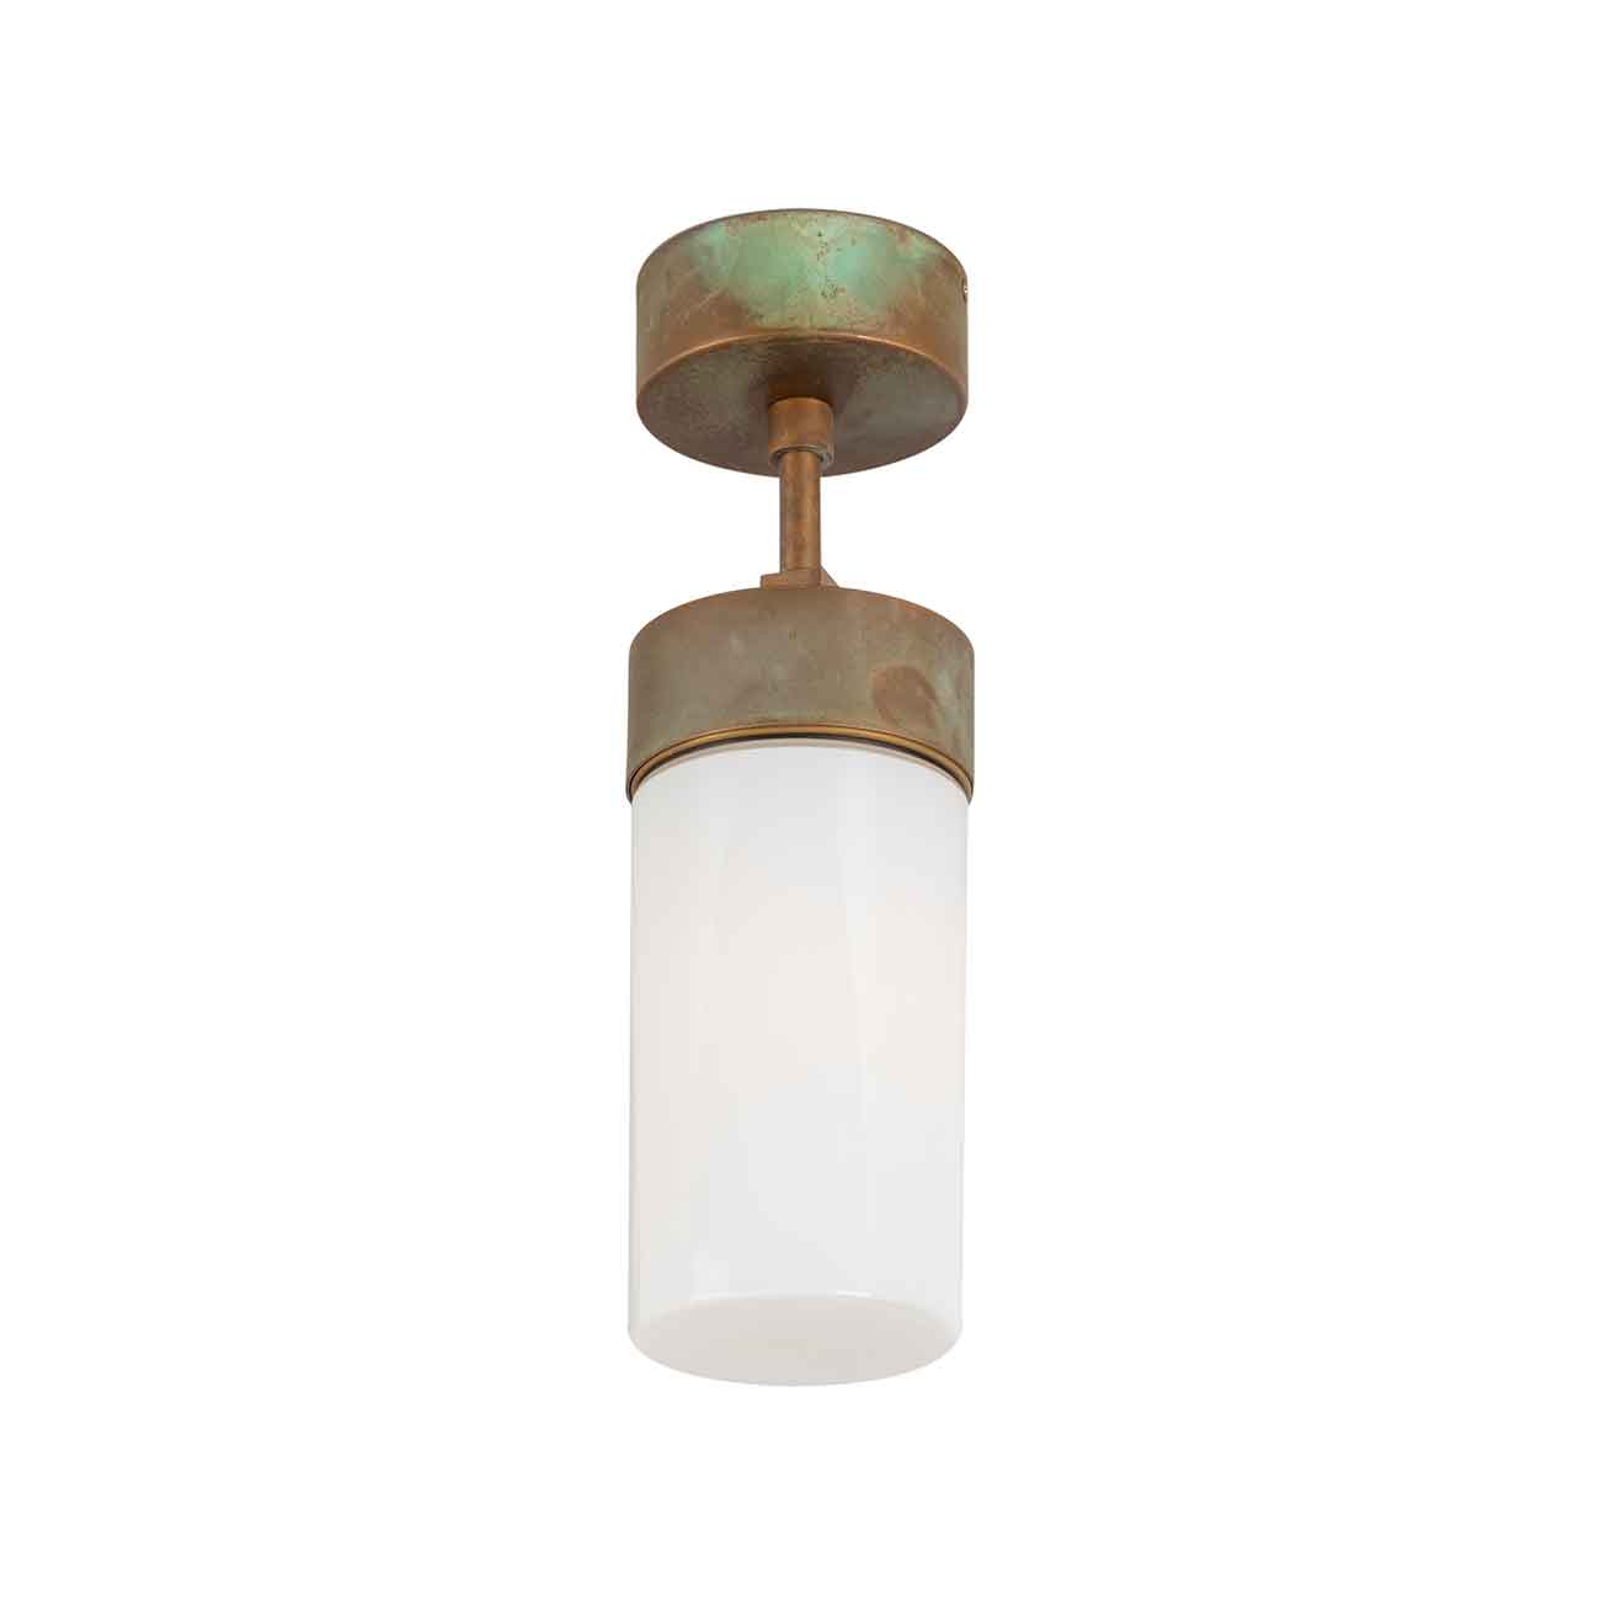 Lampa sufitowa Silindar 3357 mosiądz antyk/opal